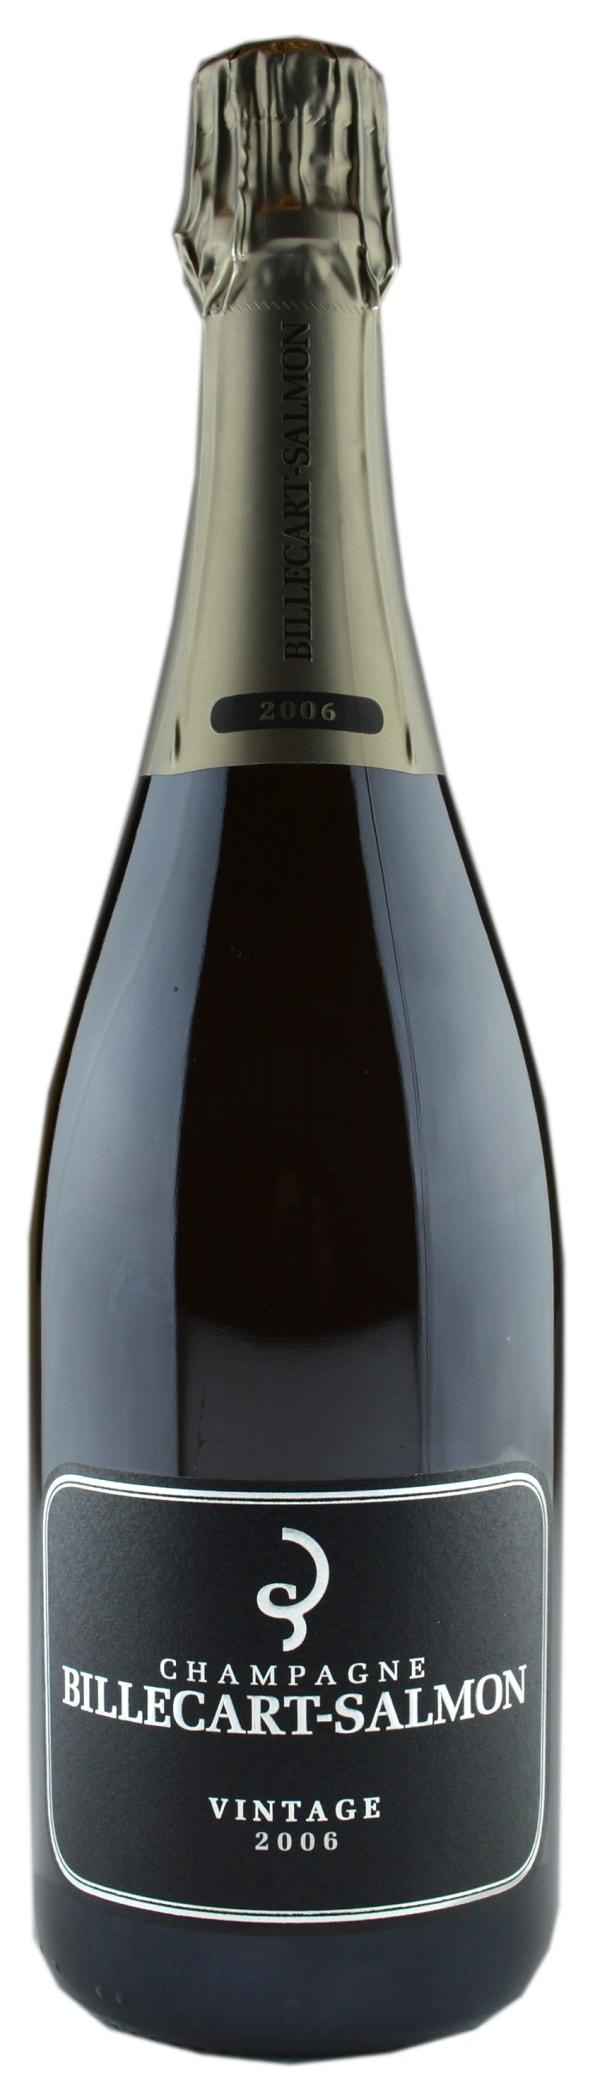 Billecart-Salmon Vintage Champagne Extra Brut  2007